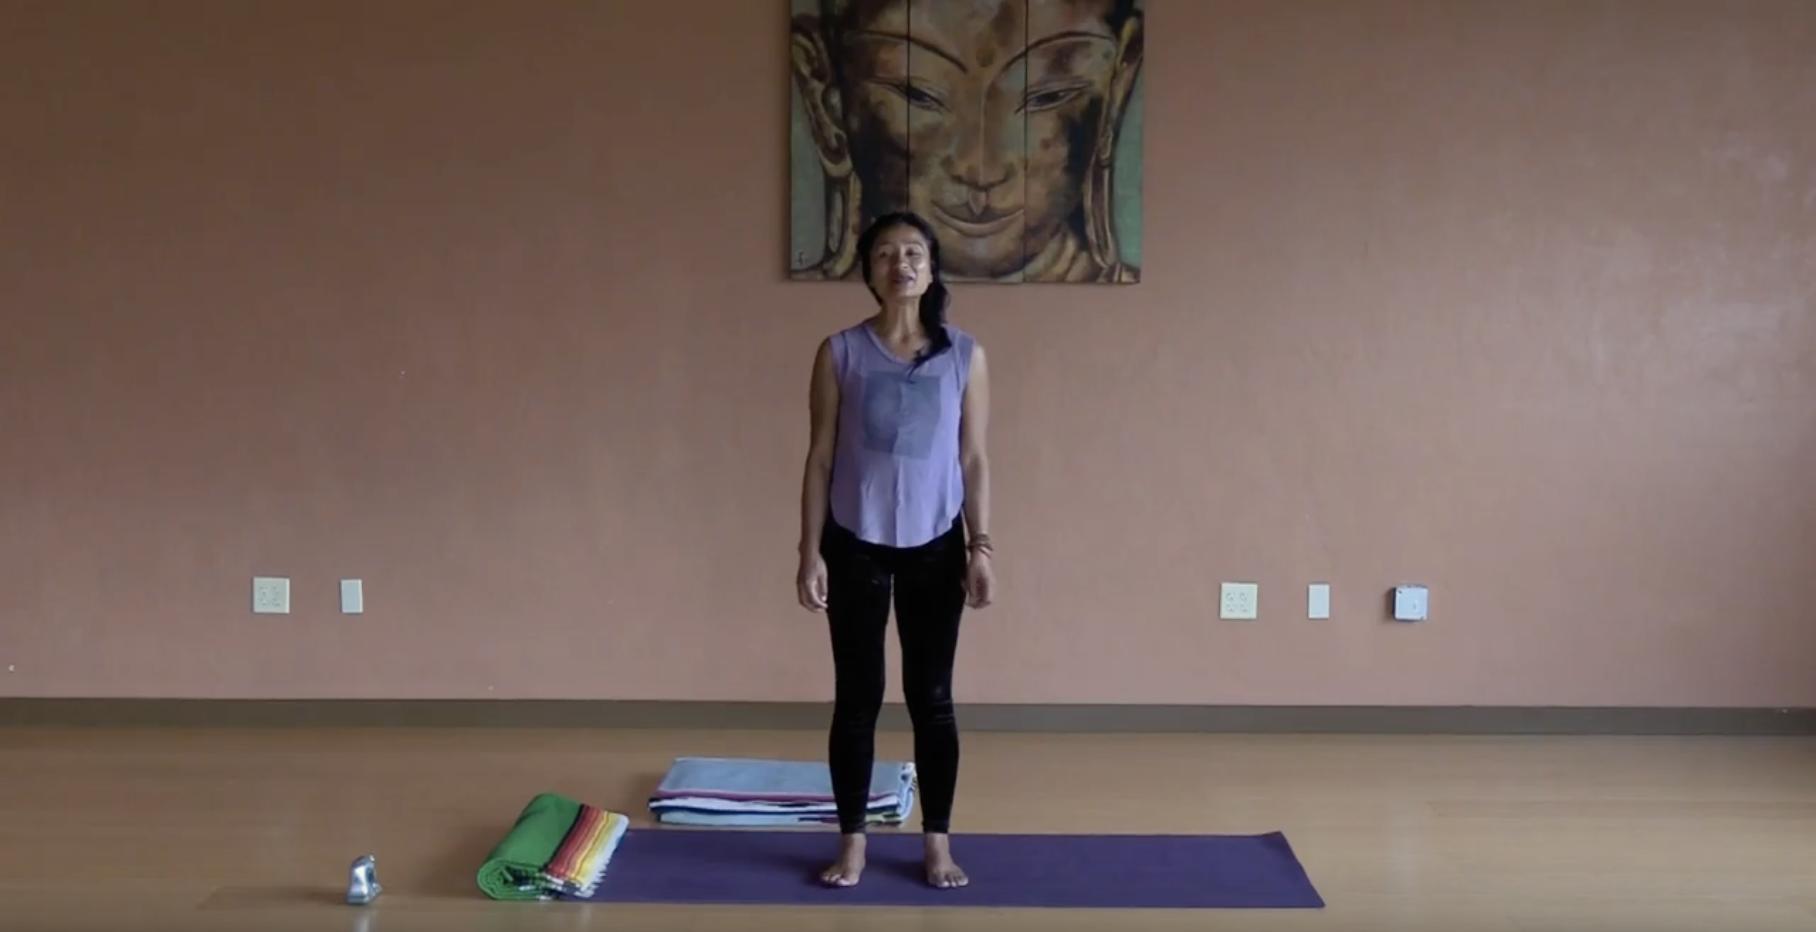 Yoga en Espanol - Episode #2